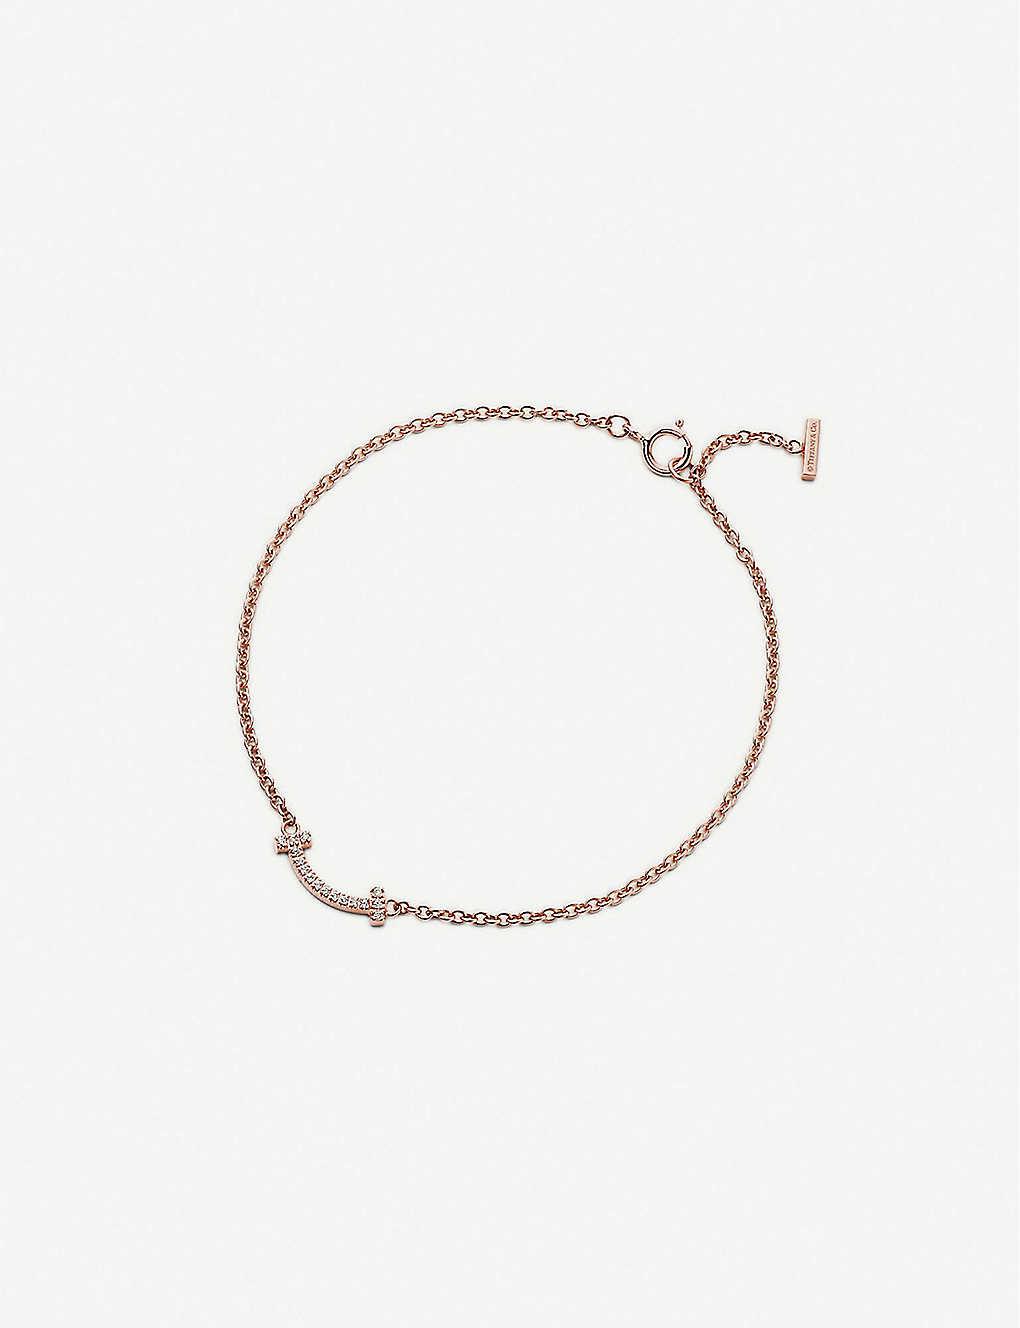 e39237860 Tiffany T Smile 18ct rose-gold and diamond bracelet - 18k rose gold ...